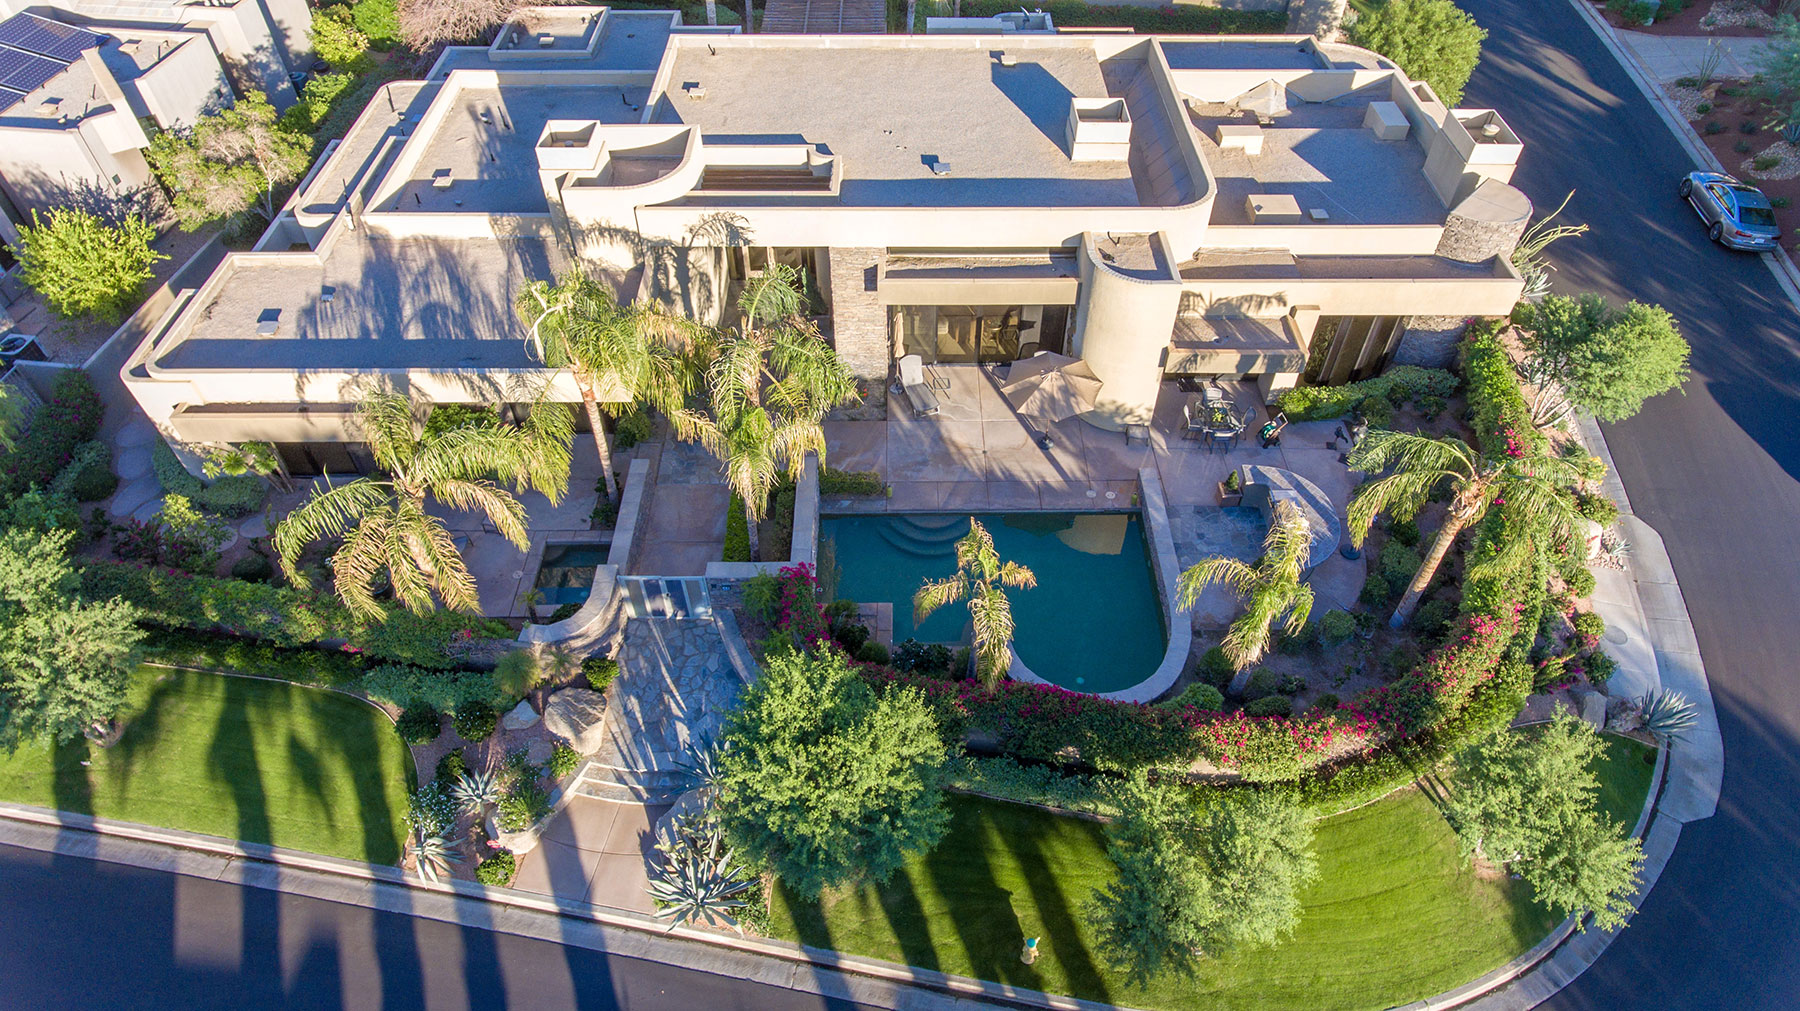 Single Family Home for Sale at 48 Ambassador Rancho Mirage, California 92270 United States